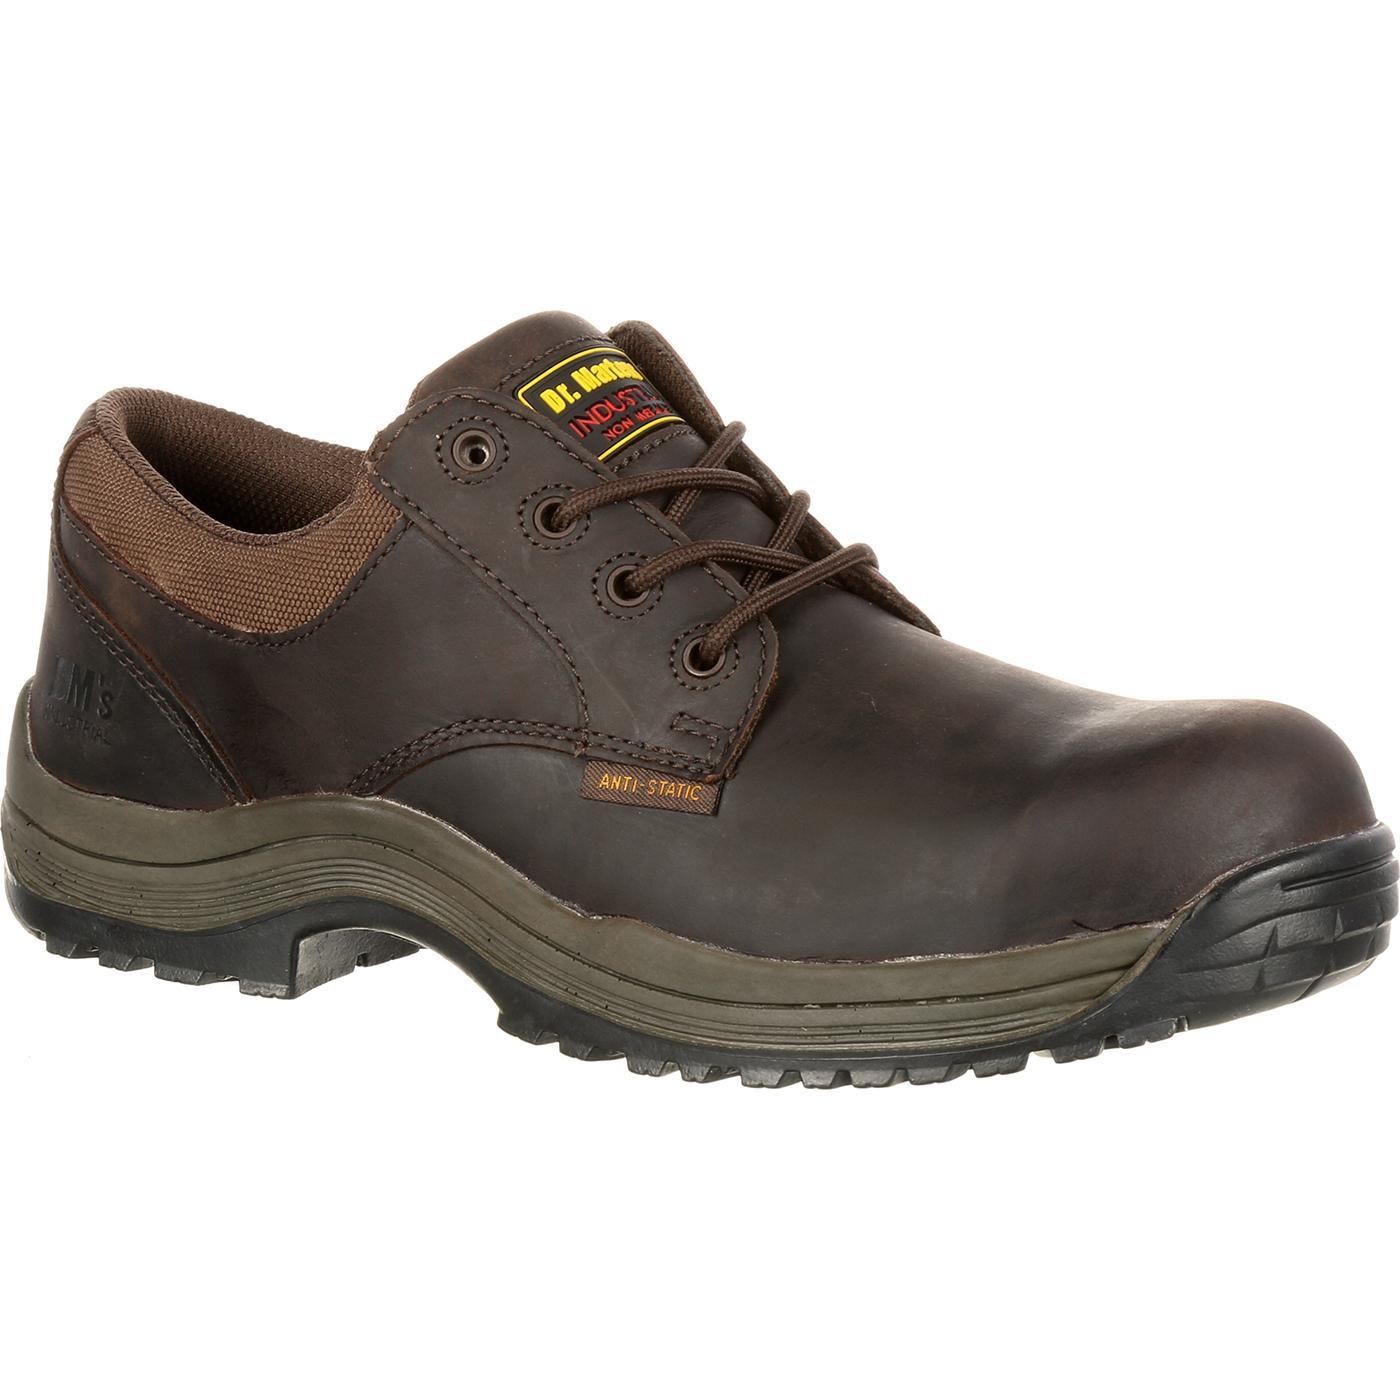 Mens Oxford Slip Resistant Shoes